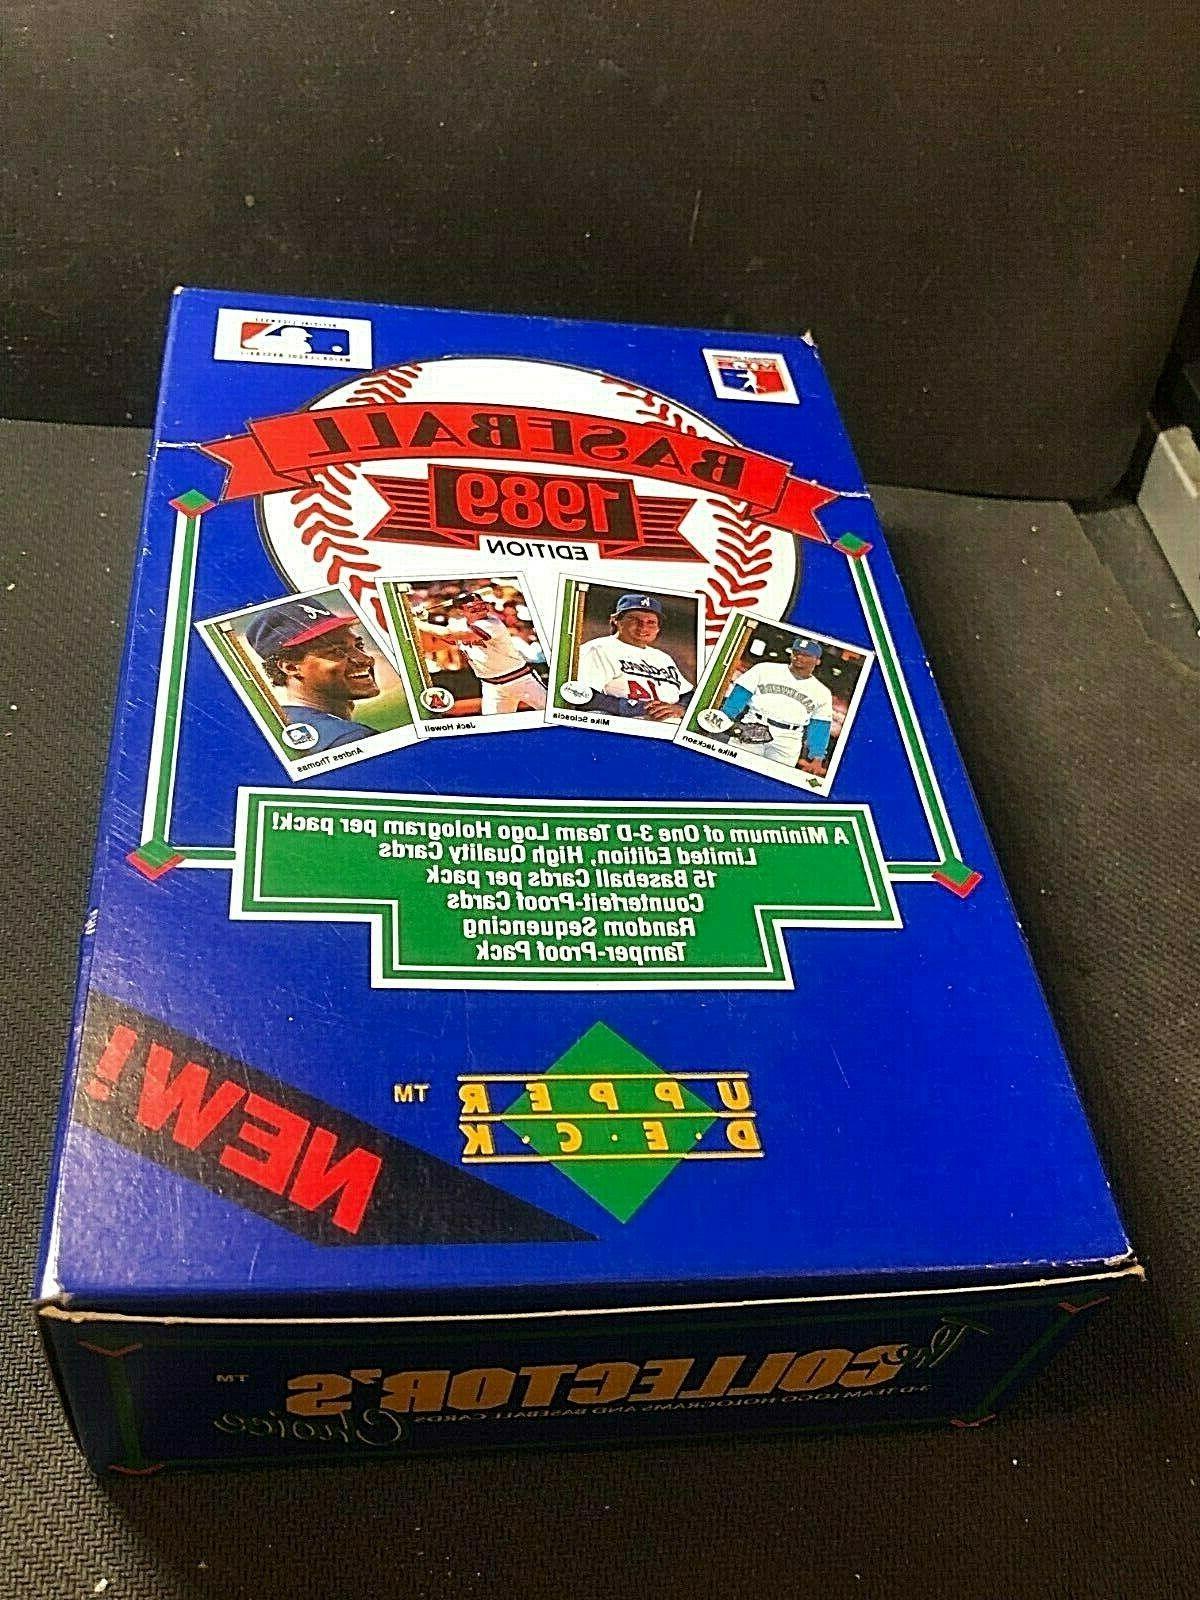 1989 upper deck low series box of